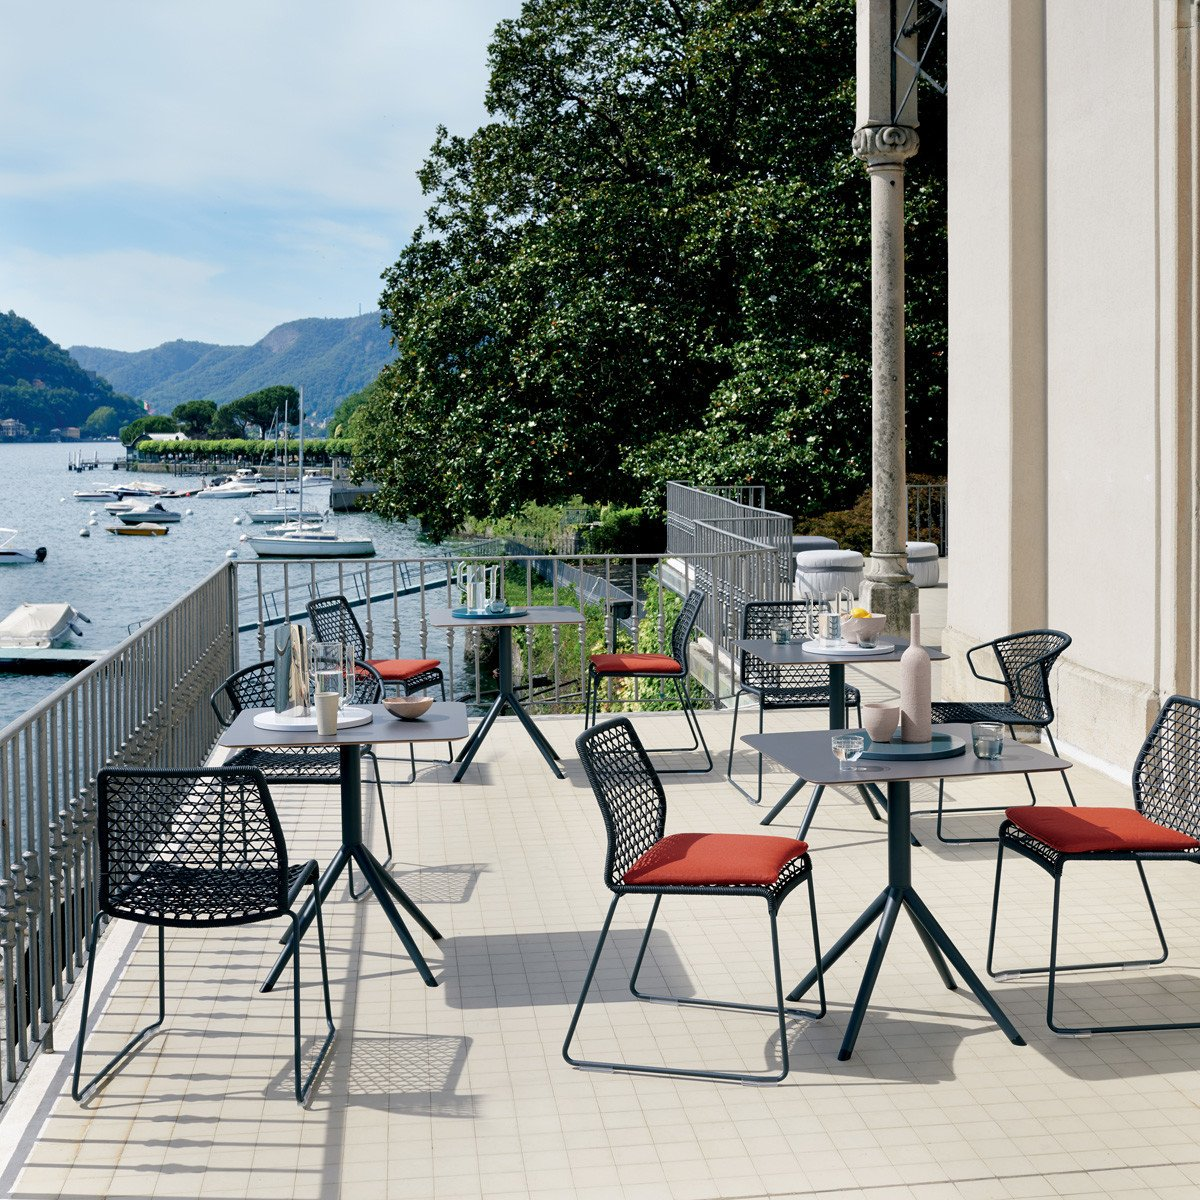 OTX Table bar from Potocco, designed by Gabriele & Oscar Buratti